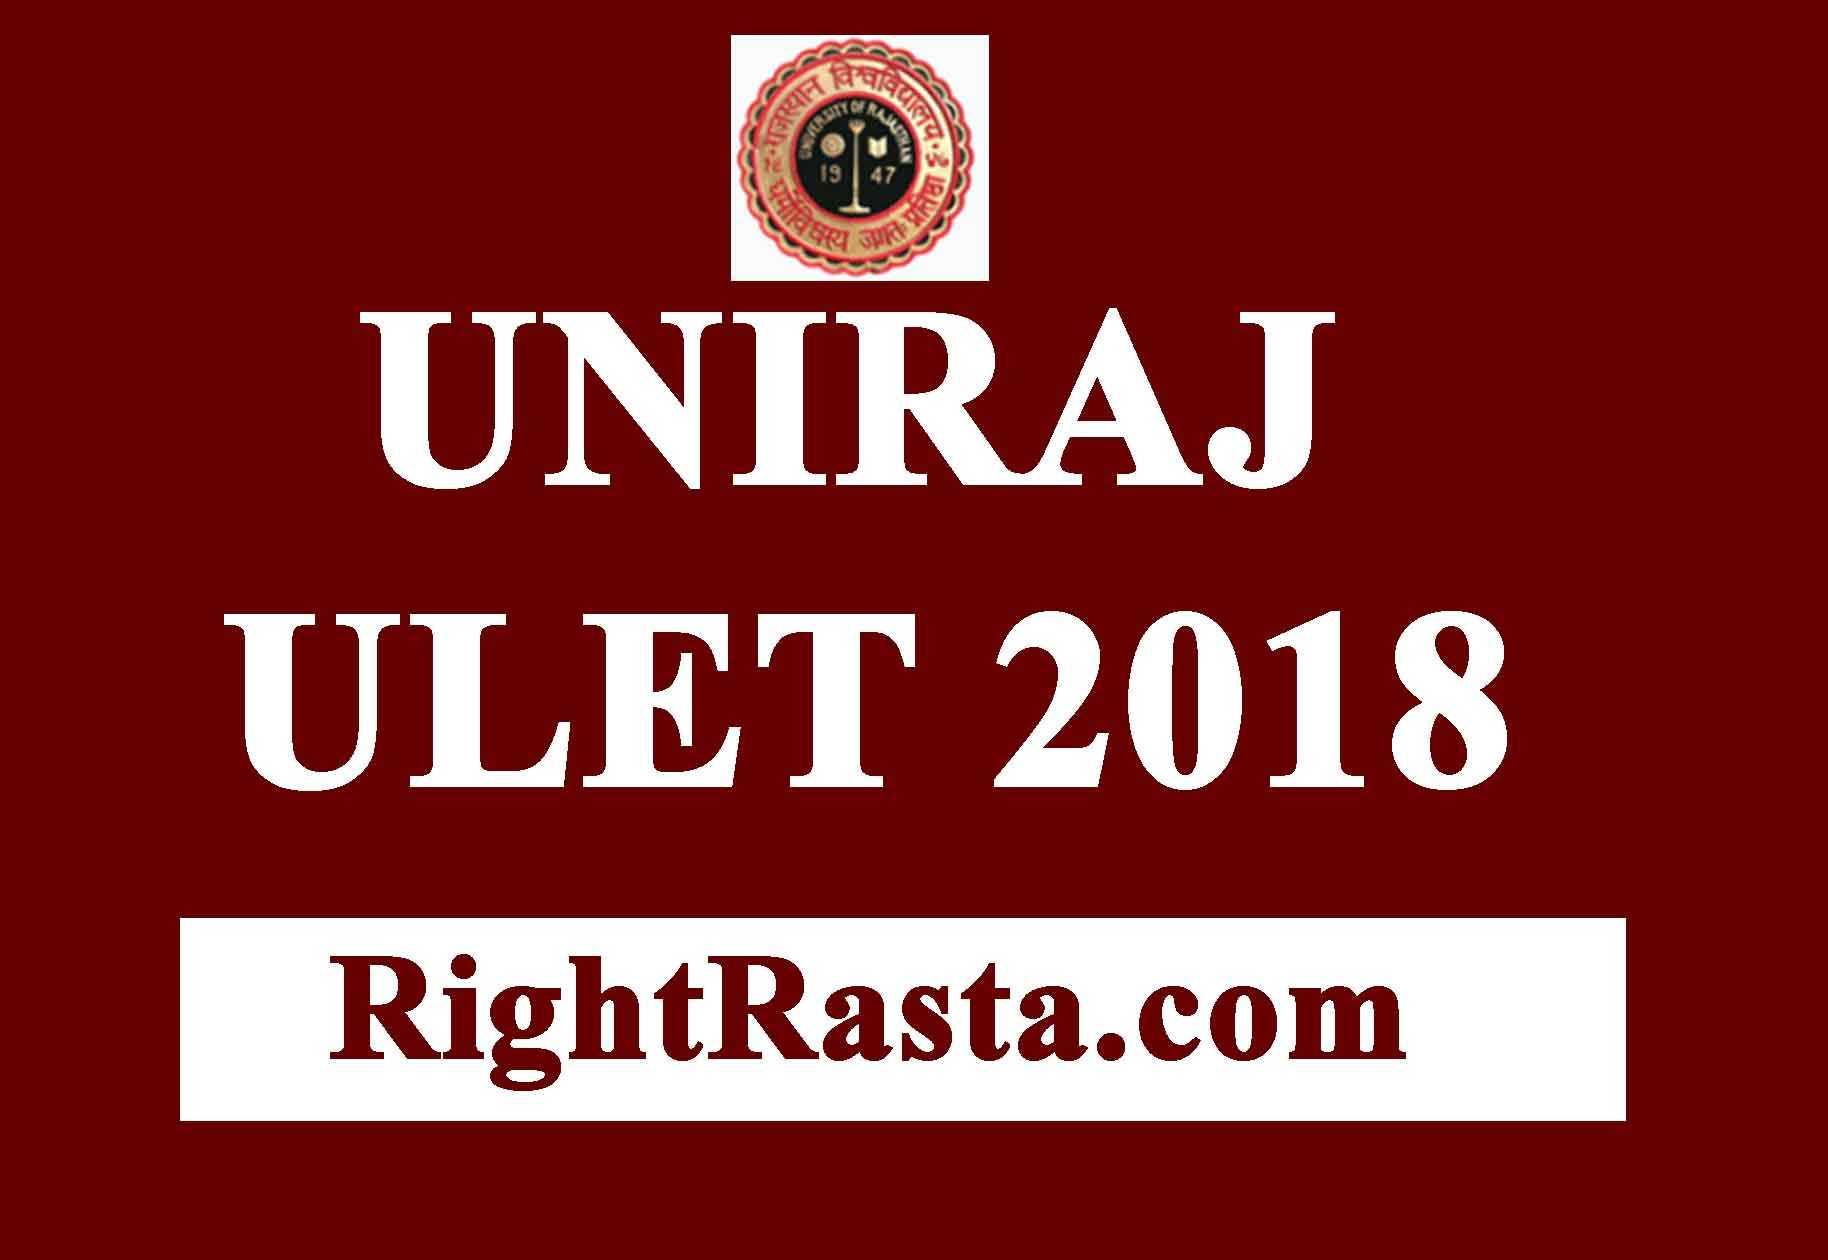 UNIRAJ ULET 2018